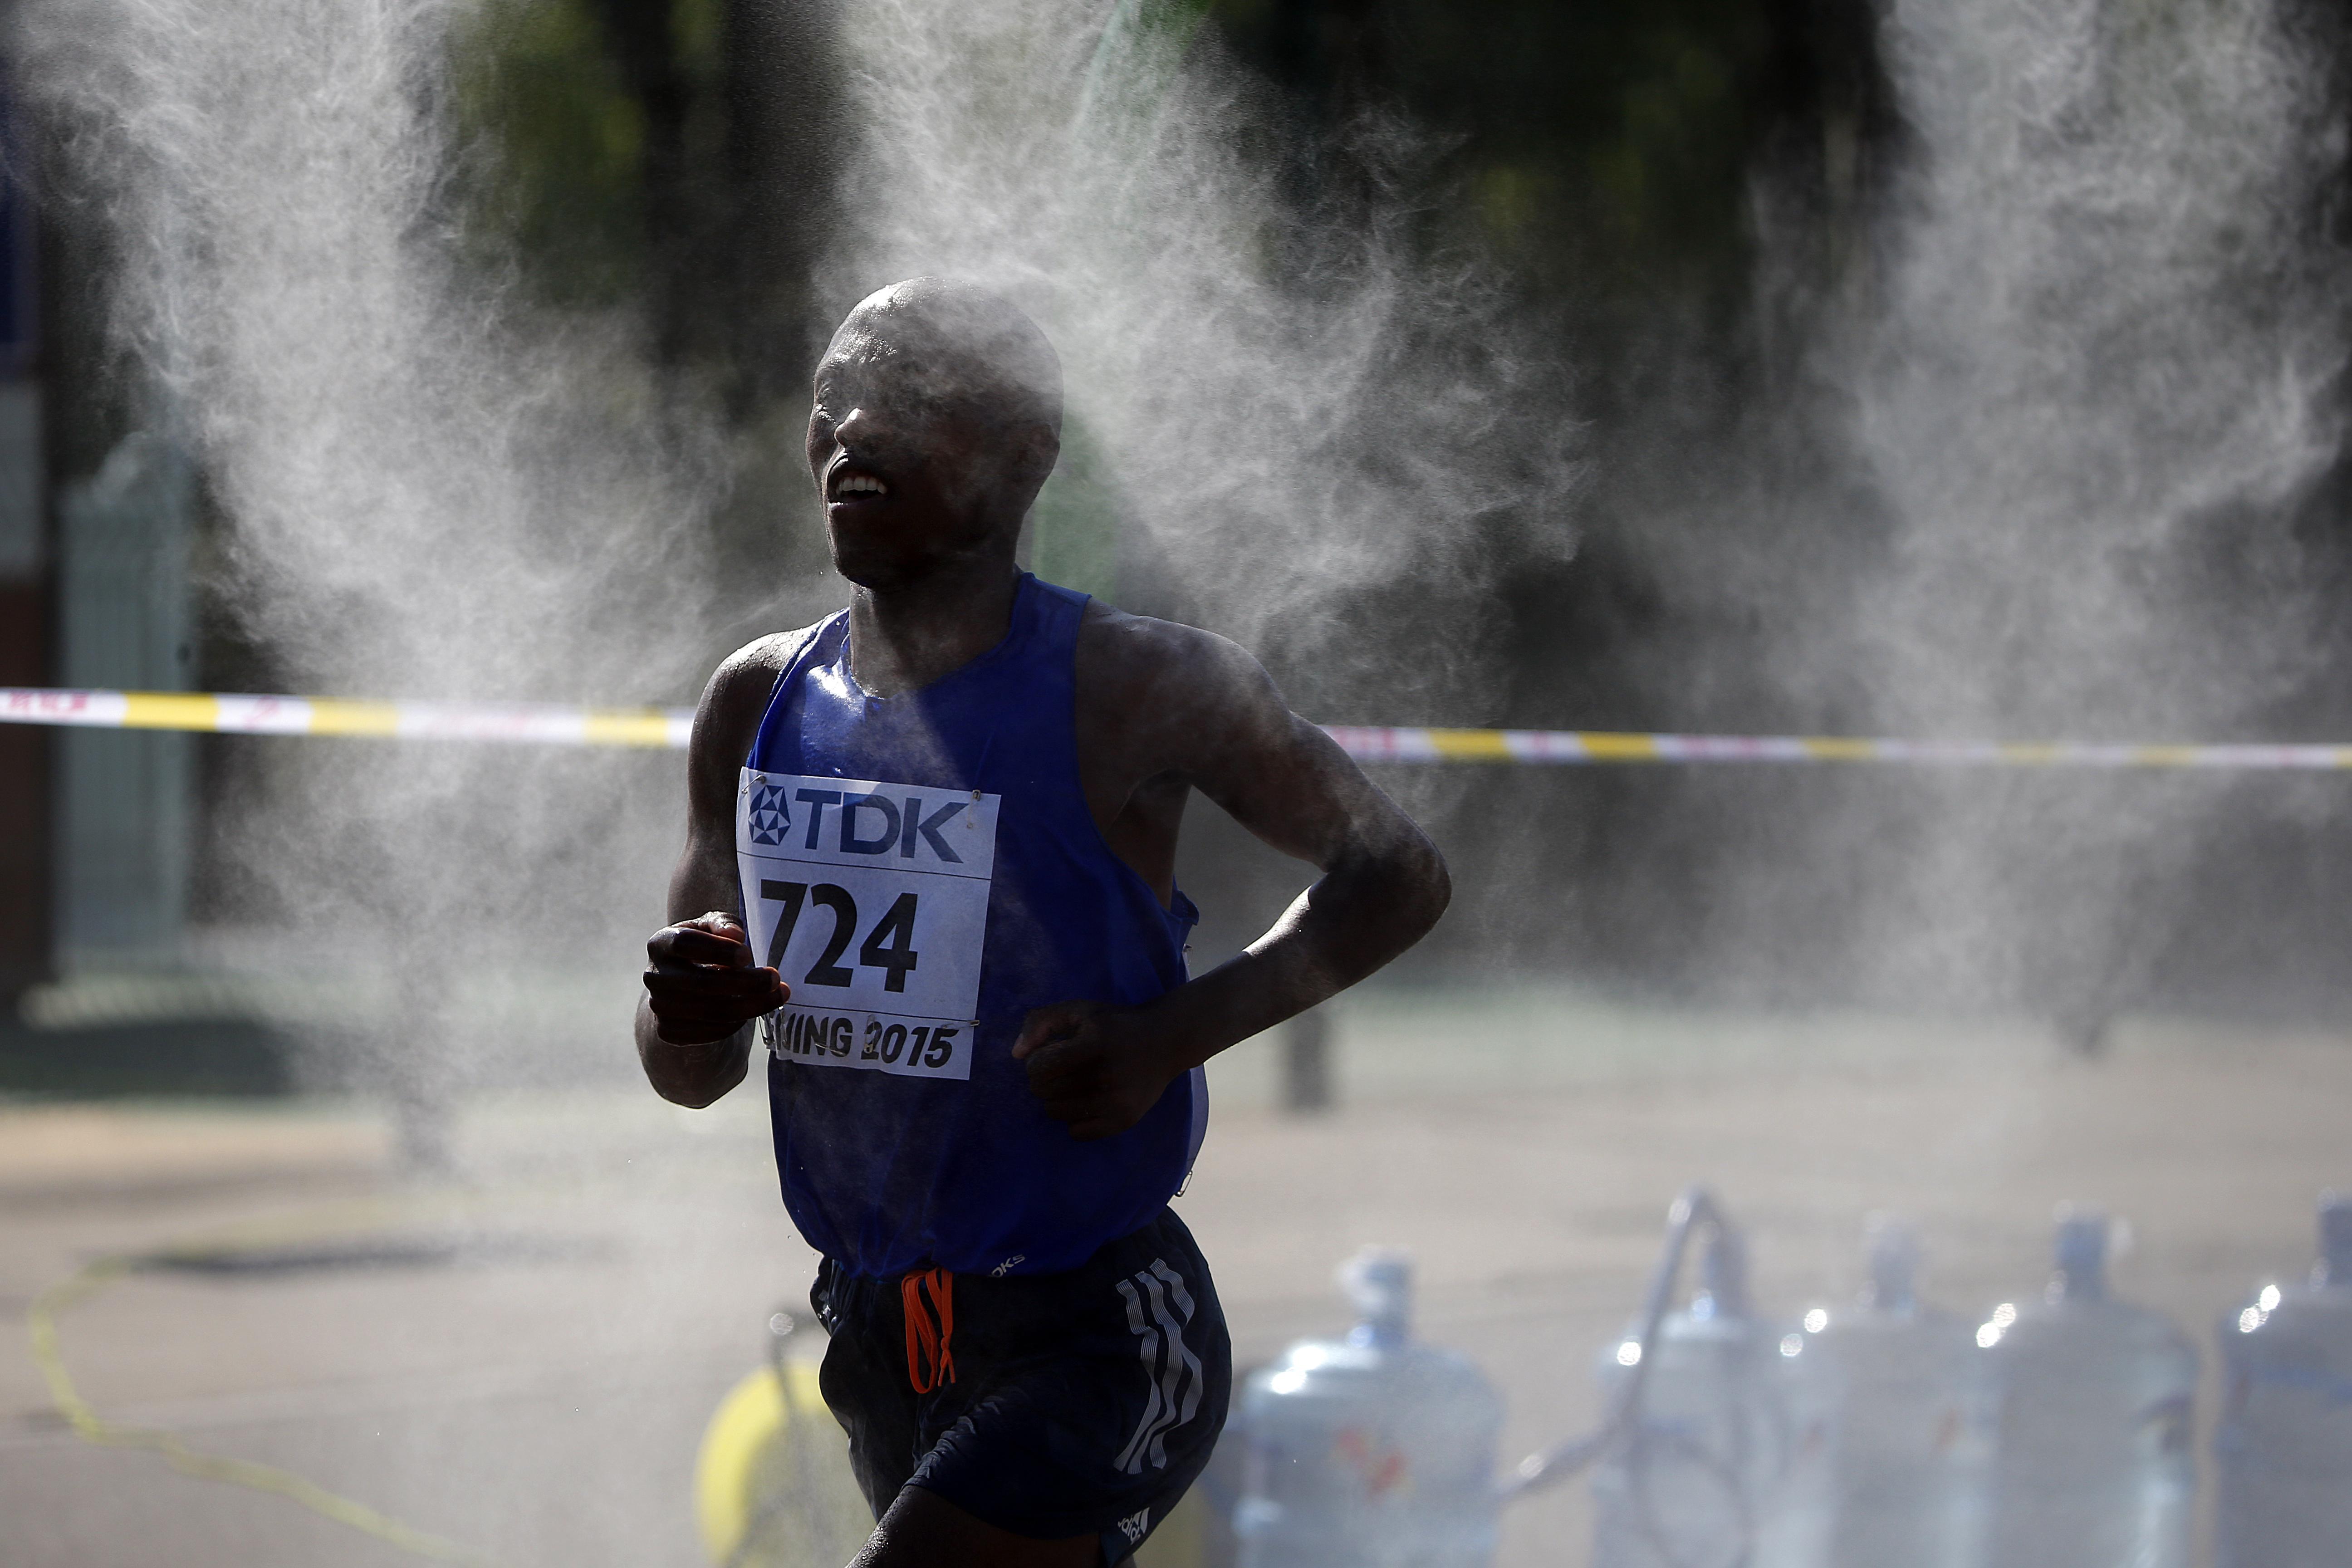 Tsepo Mathibelle runs in the men's marathon at the 2015 IAAF World Championships in Beijing.